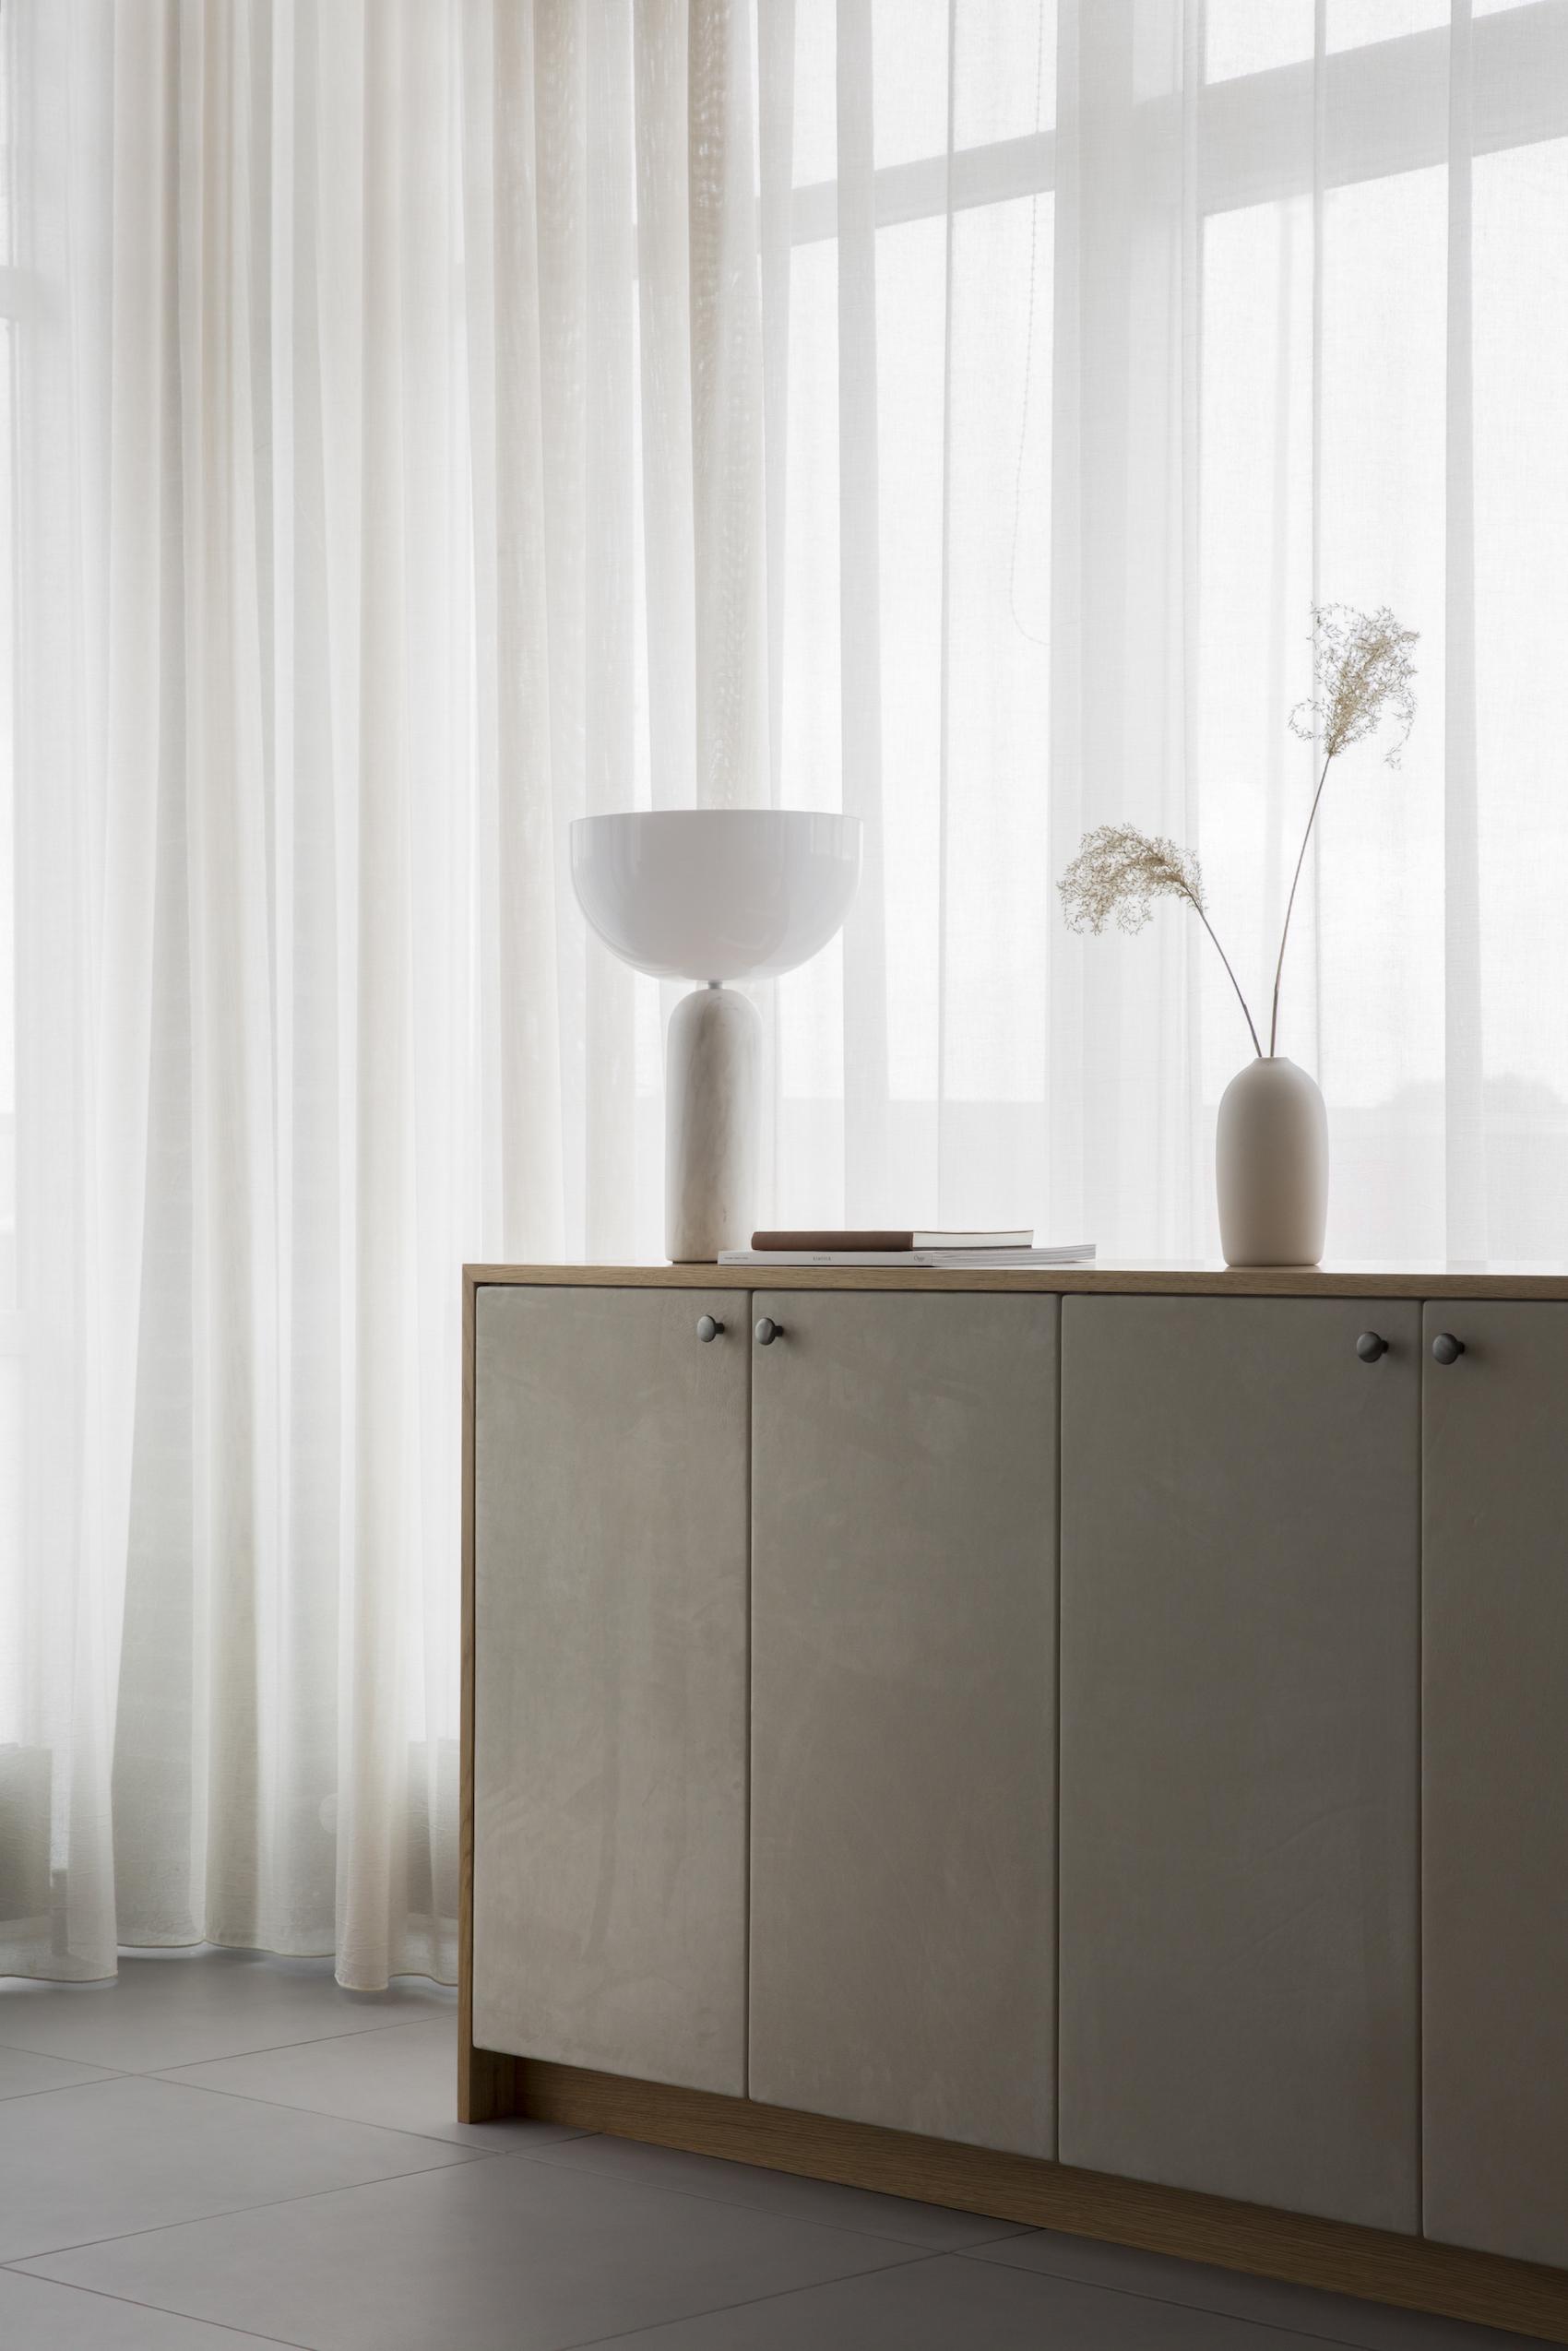 Sørensen HQ in Aarhus, Denmark by Norm Architects